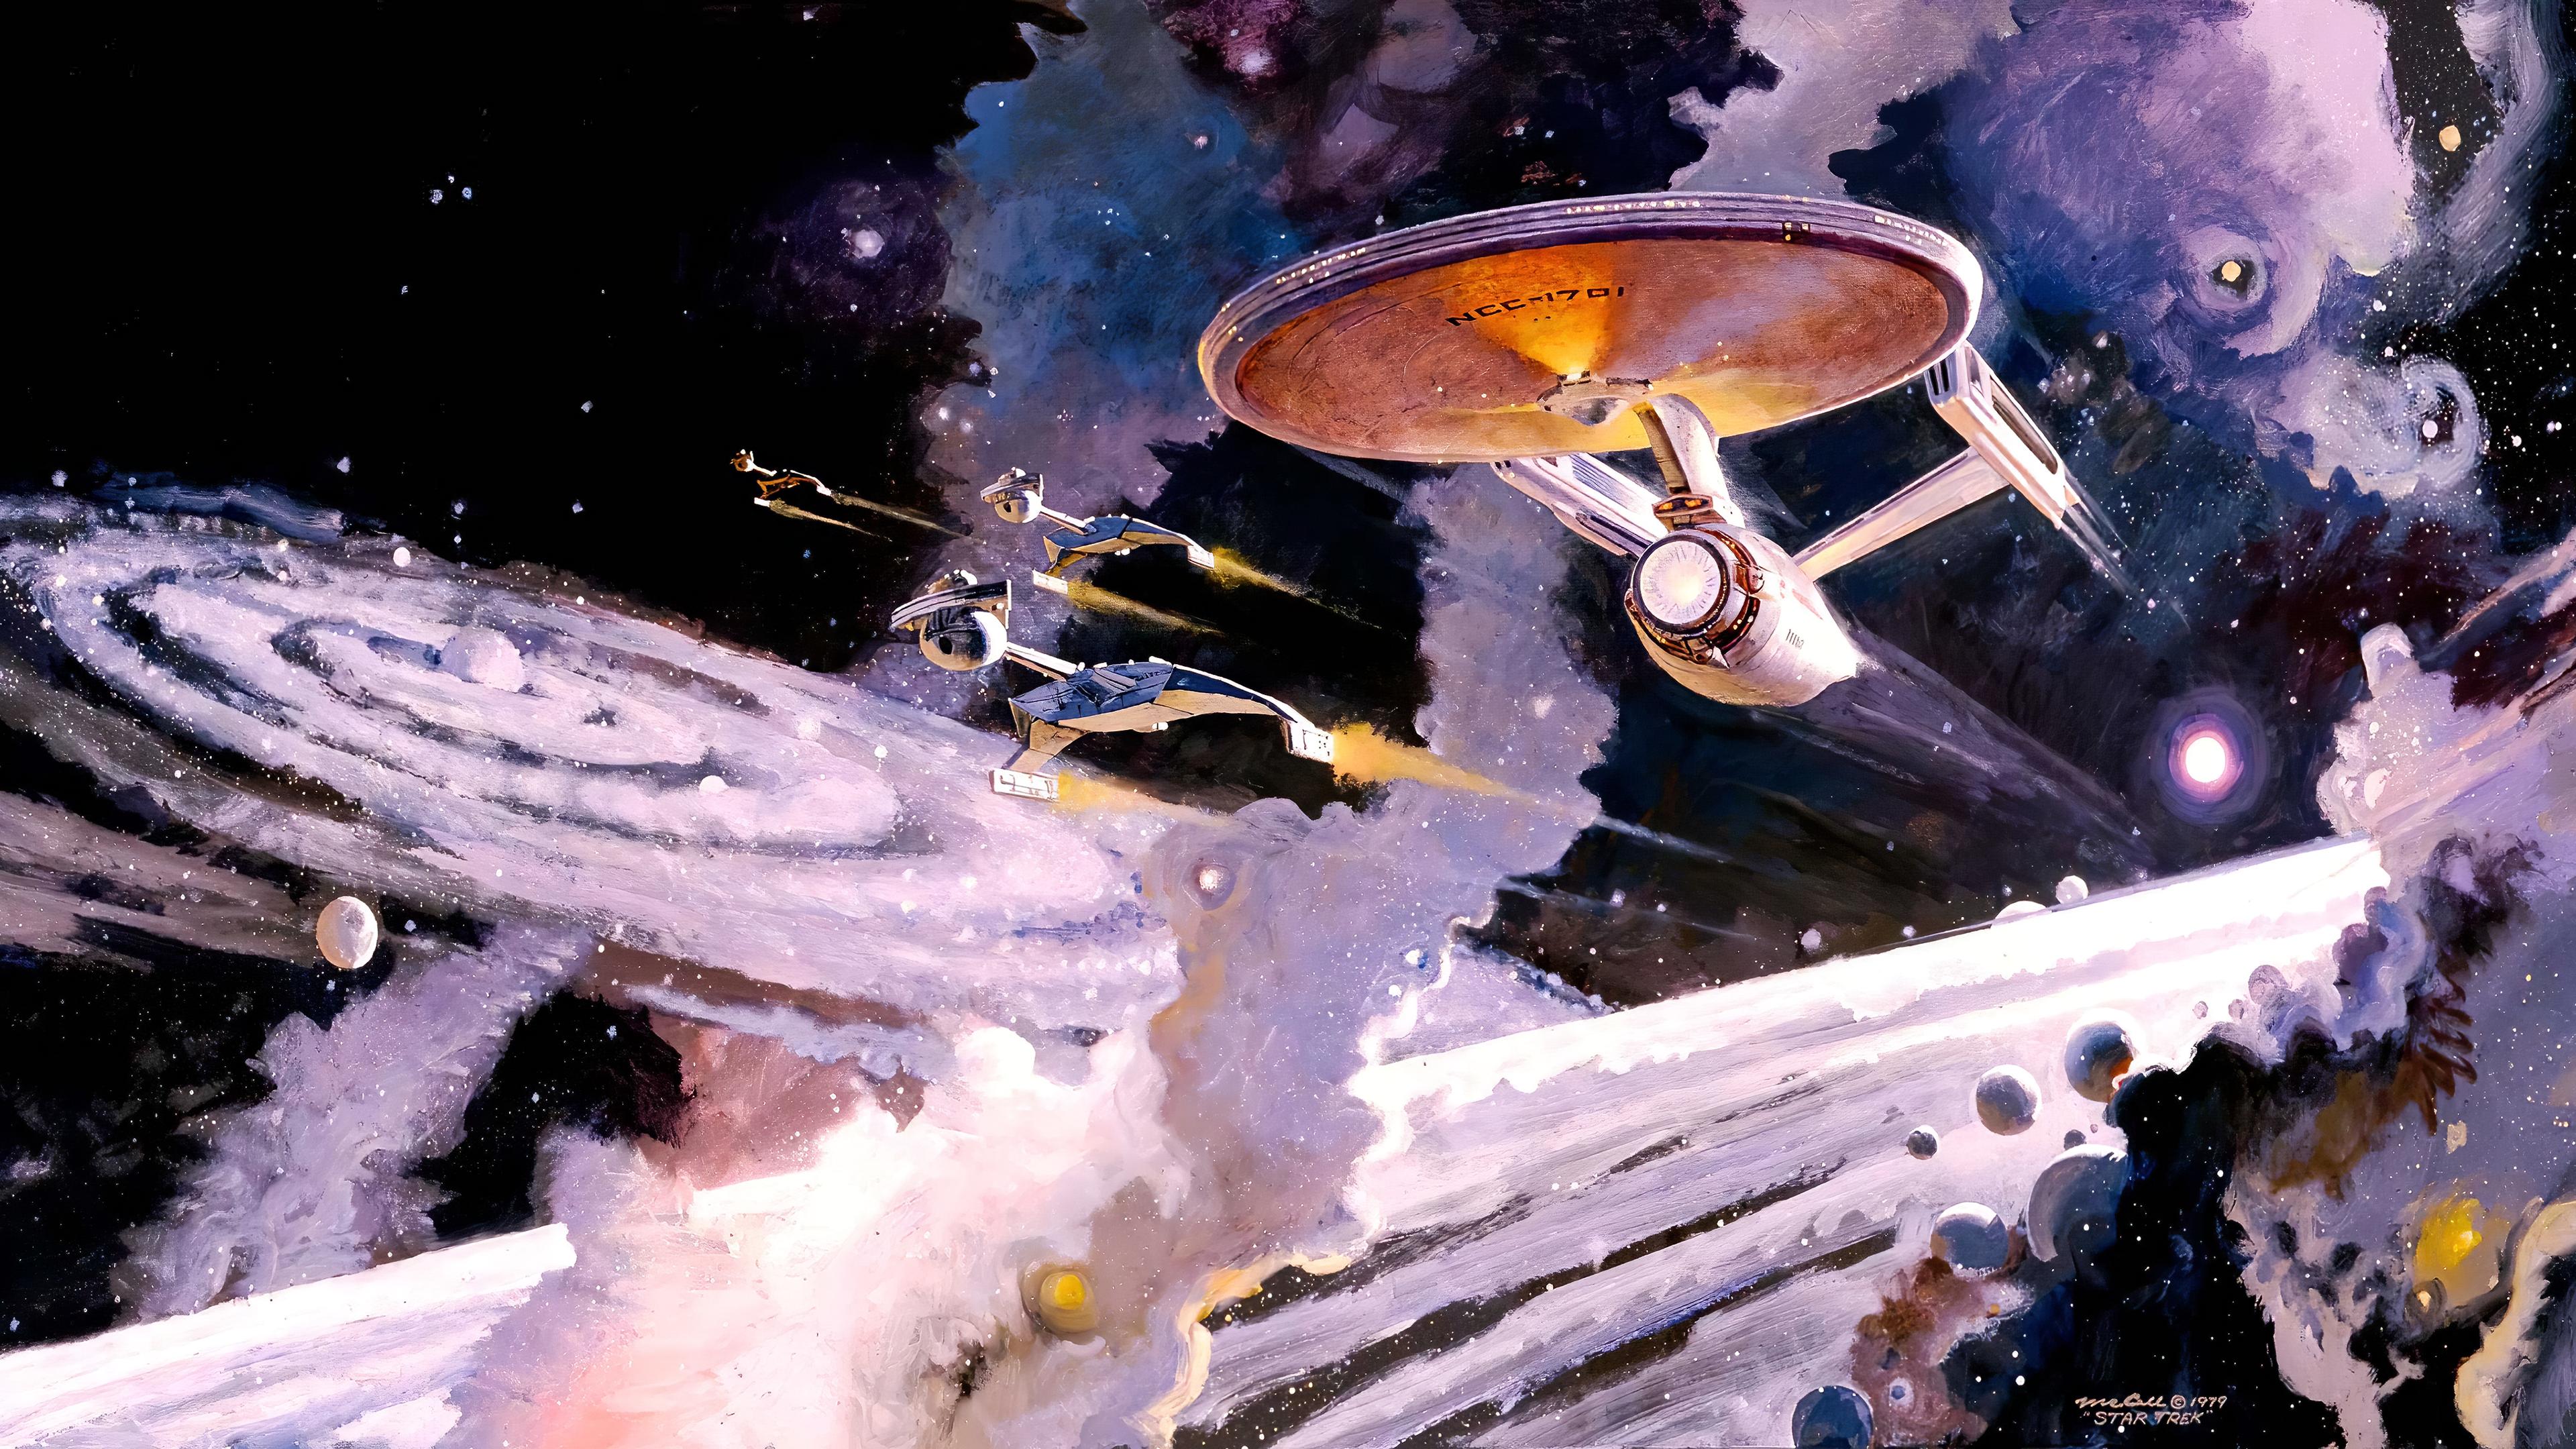 General 3840x2160 painting artwork space universe Star Trek ncc-1701 spaceship galaxy Klingon Star Trek: Enterprise